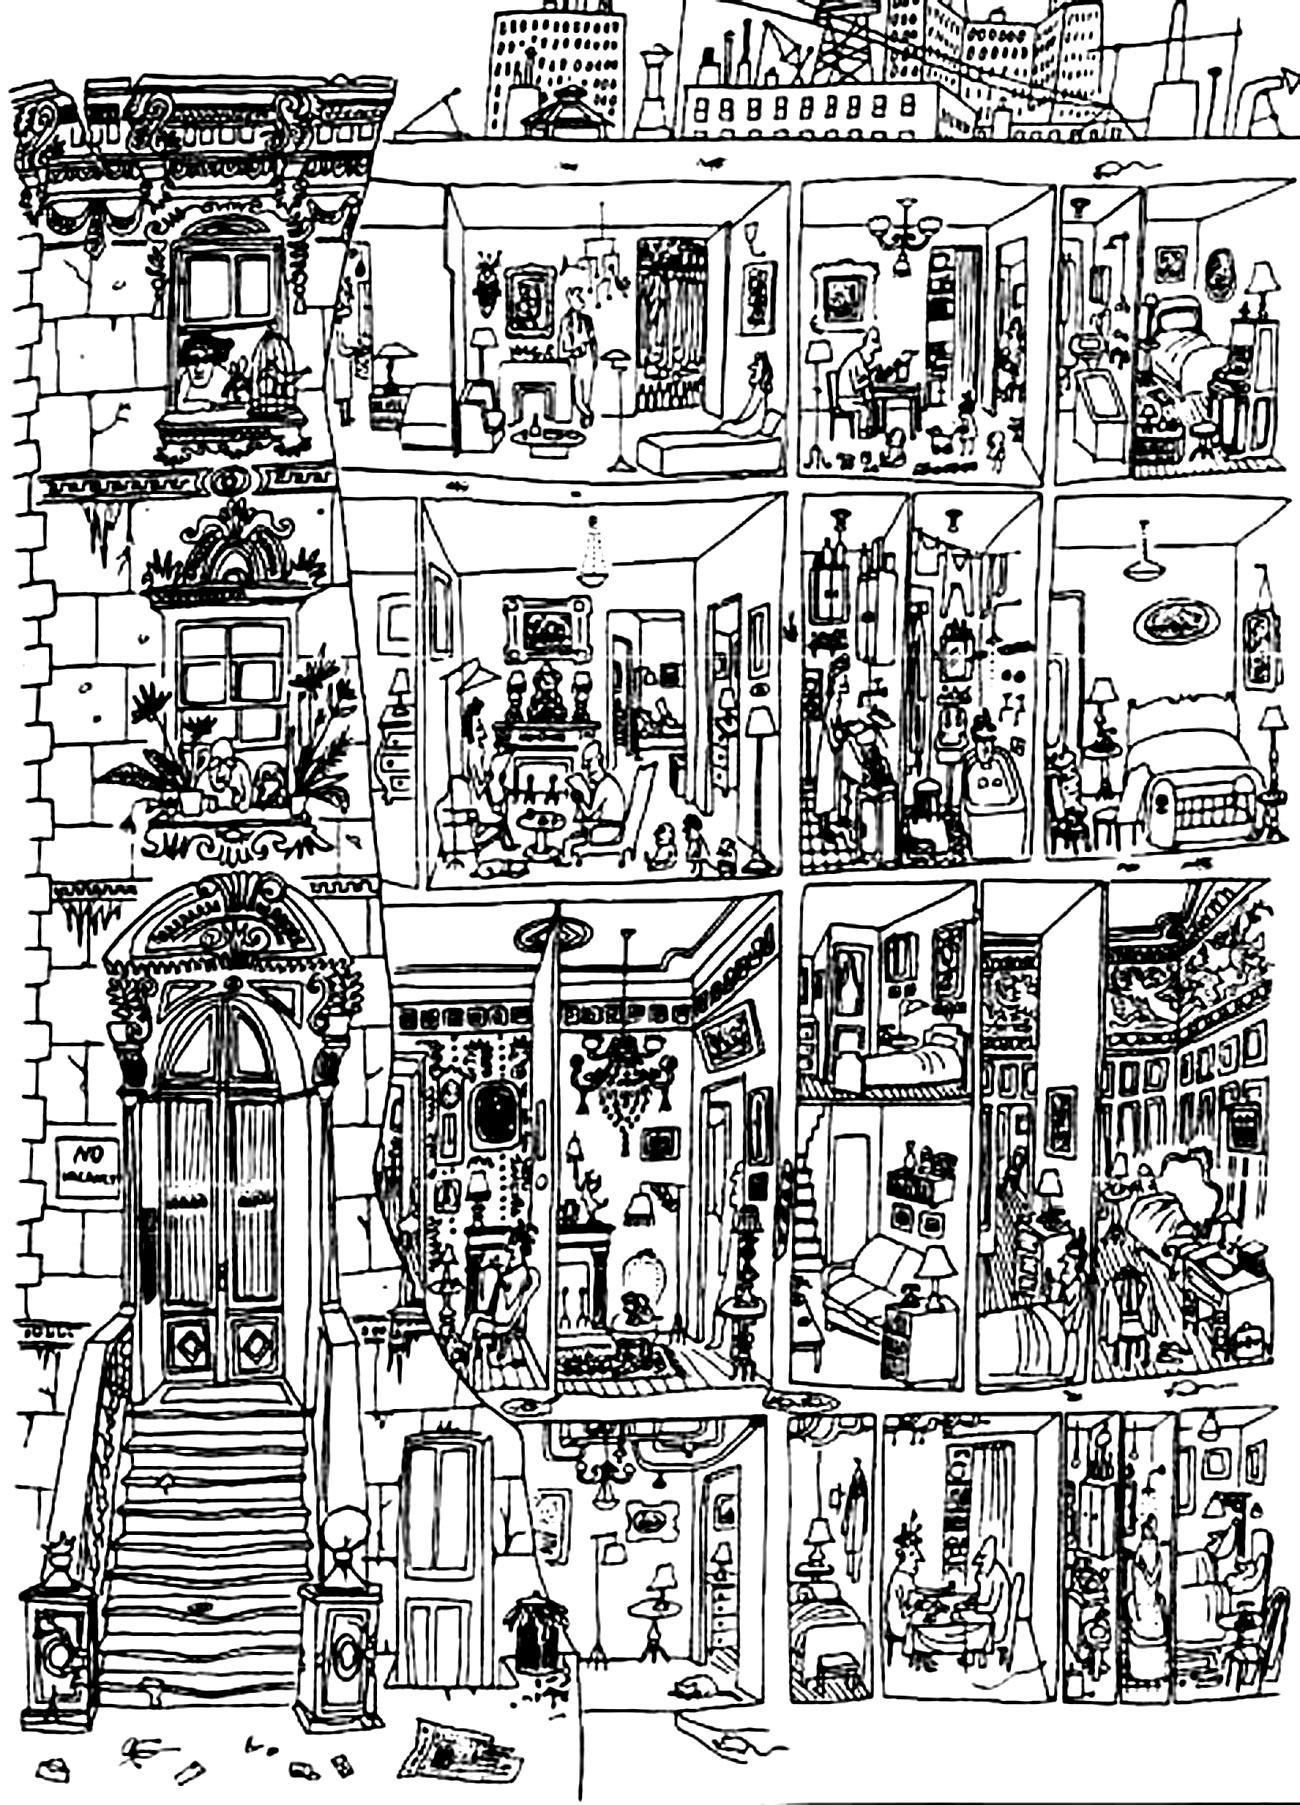 Rooming house de Saul Steinberg